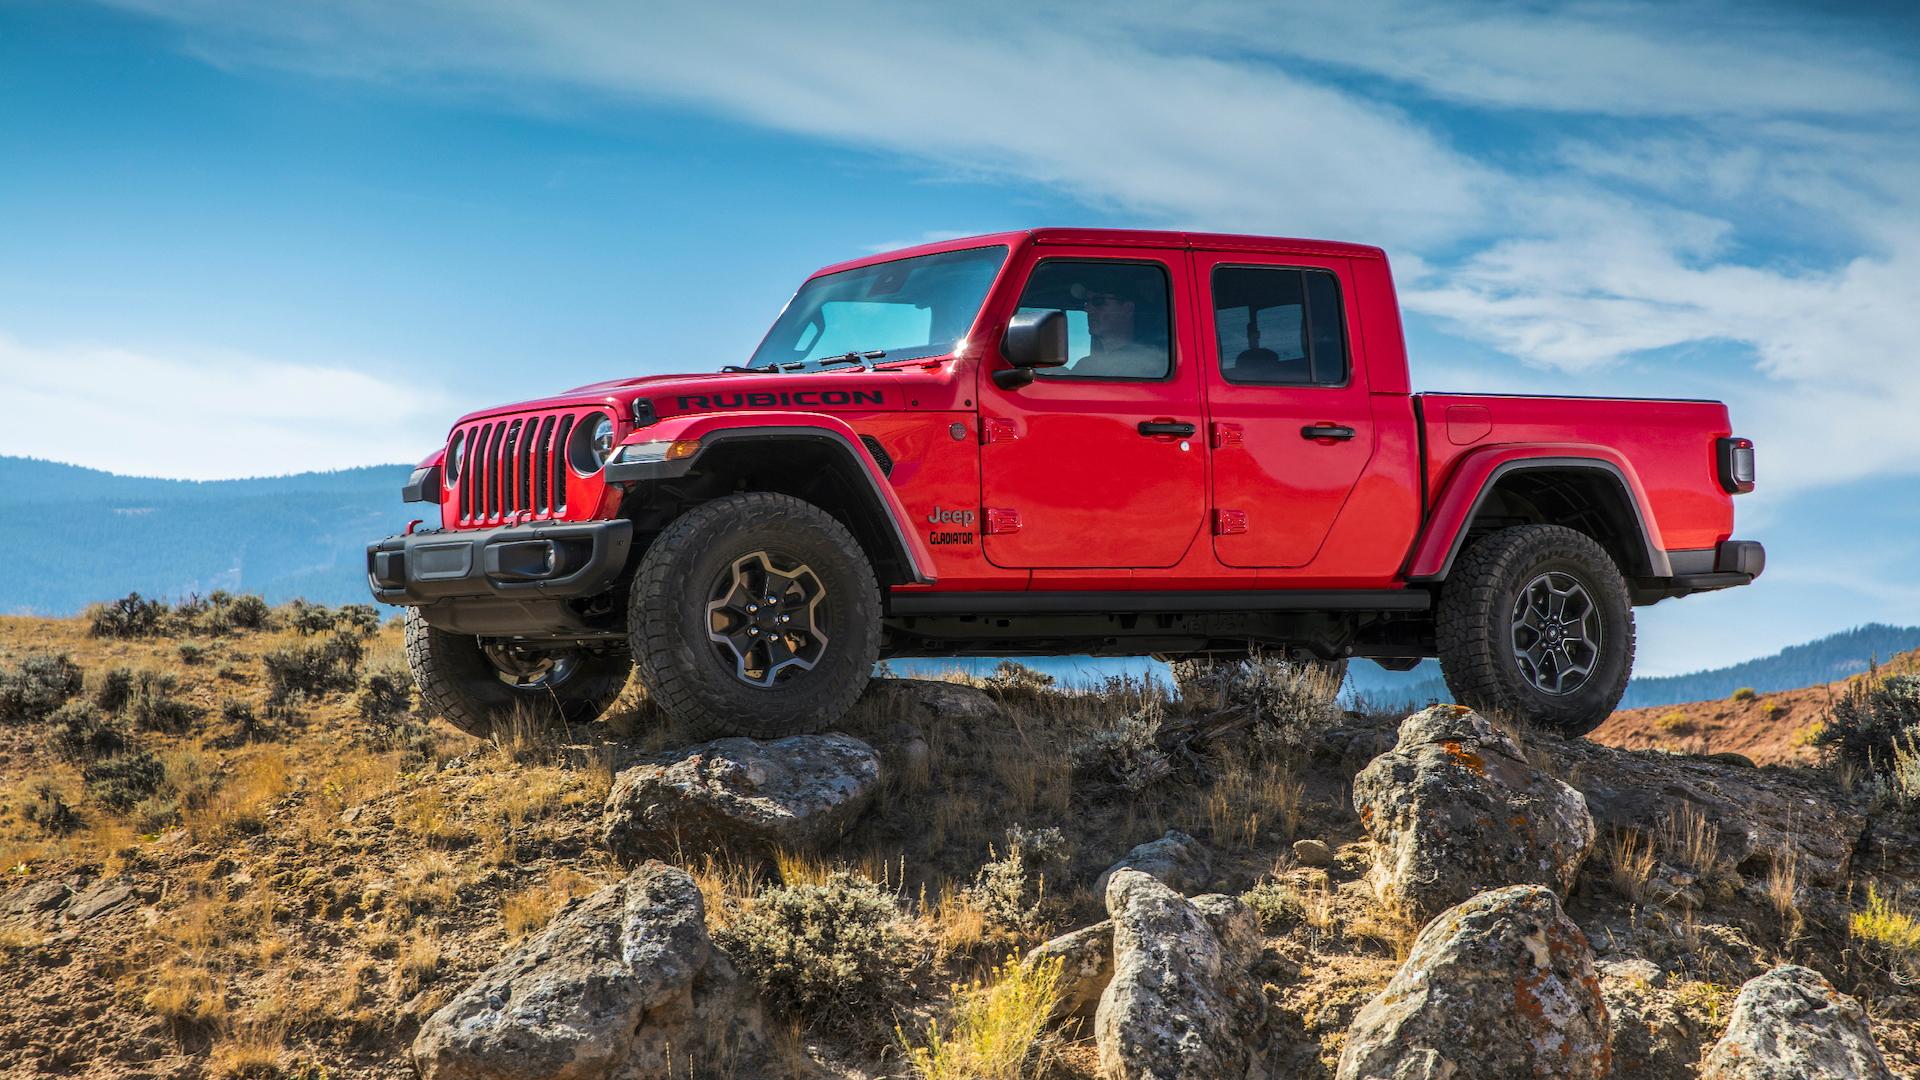 2021 Jeep Gladiator EcoDiesel